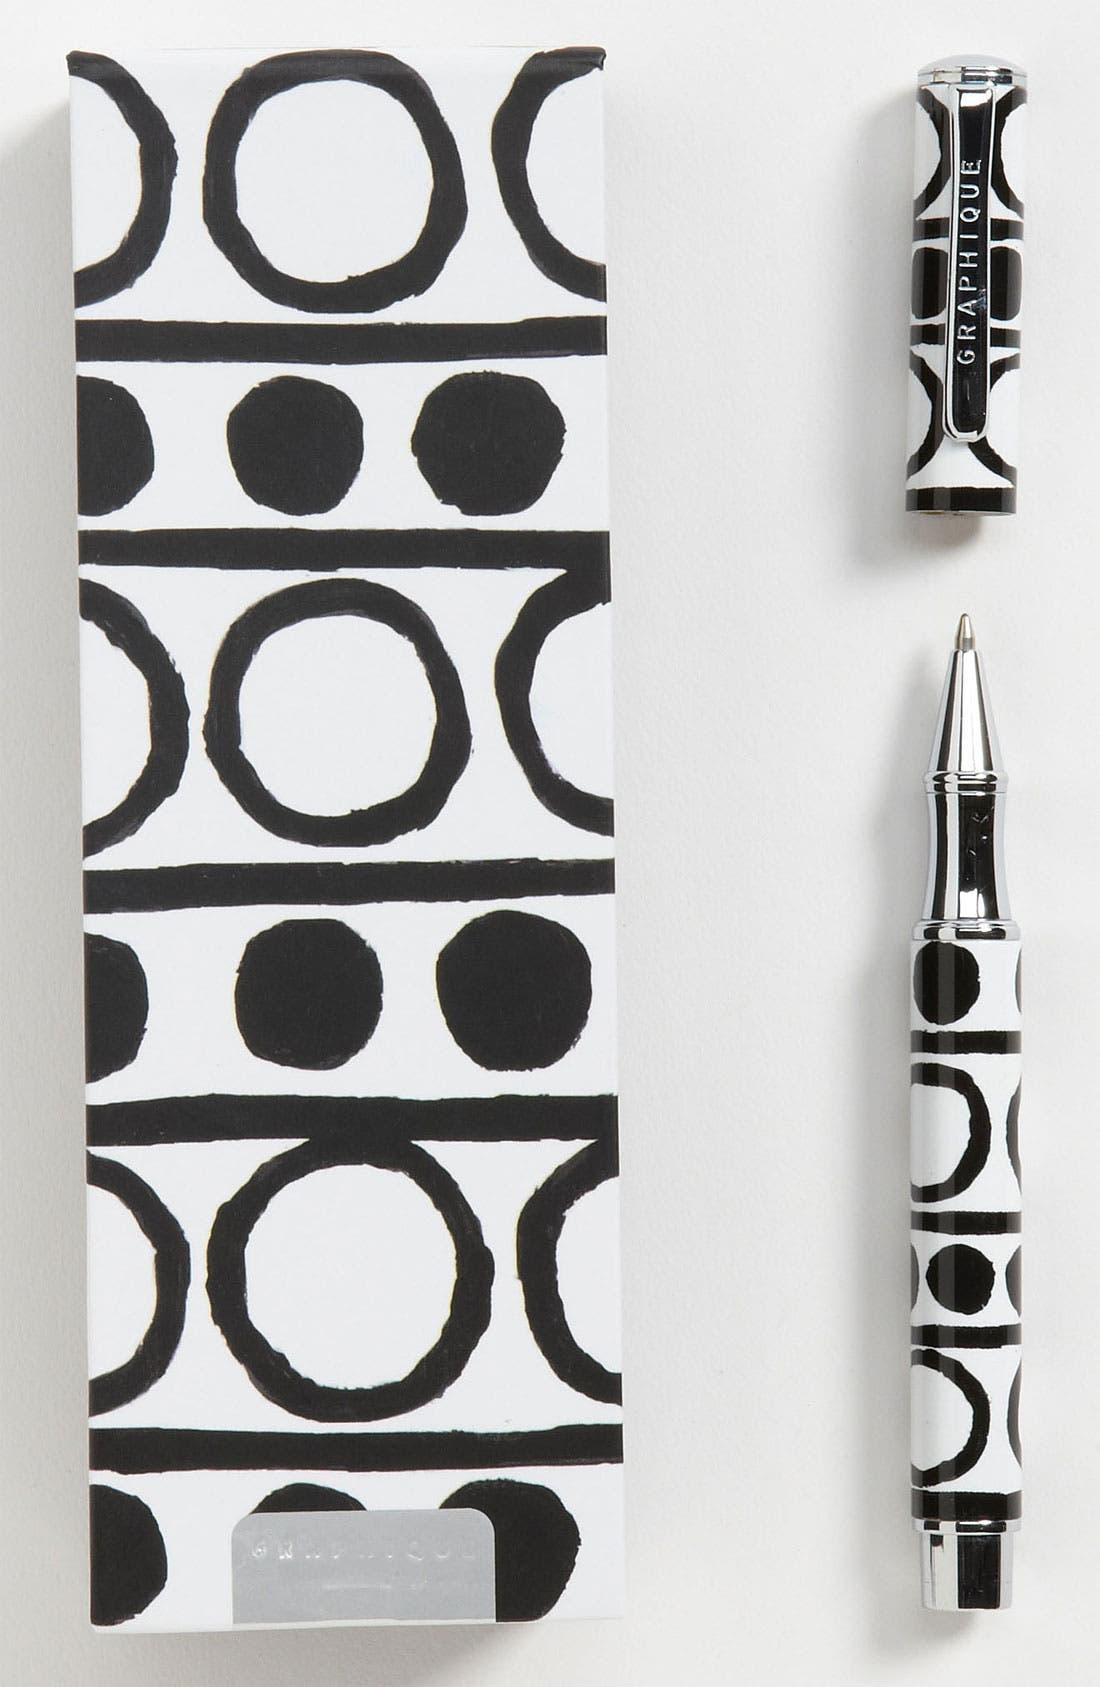 Alternate Image 1 Selected - Graphique de France 'Koco - Dots' Rollerball Pen